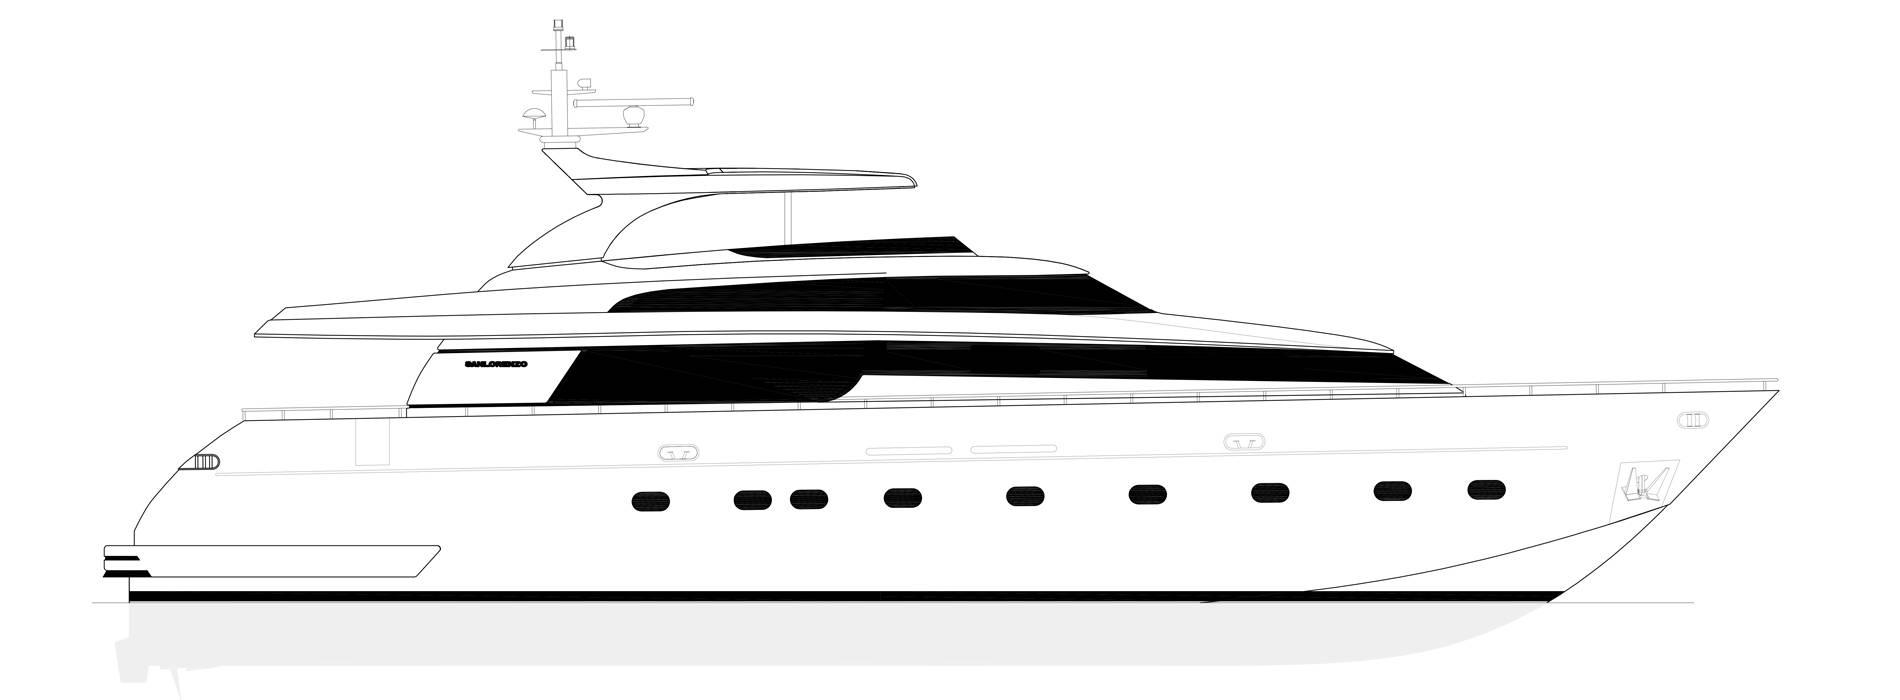 Sanlorenzo Yachts SL88-541 Профиль